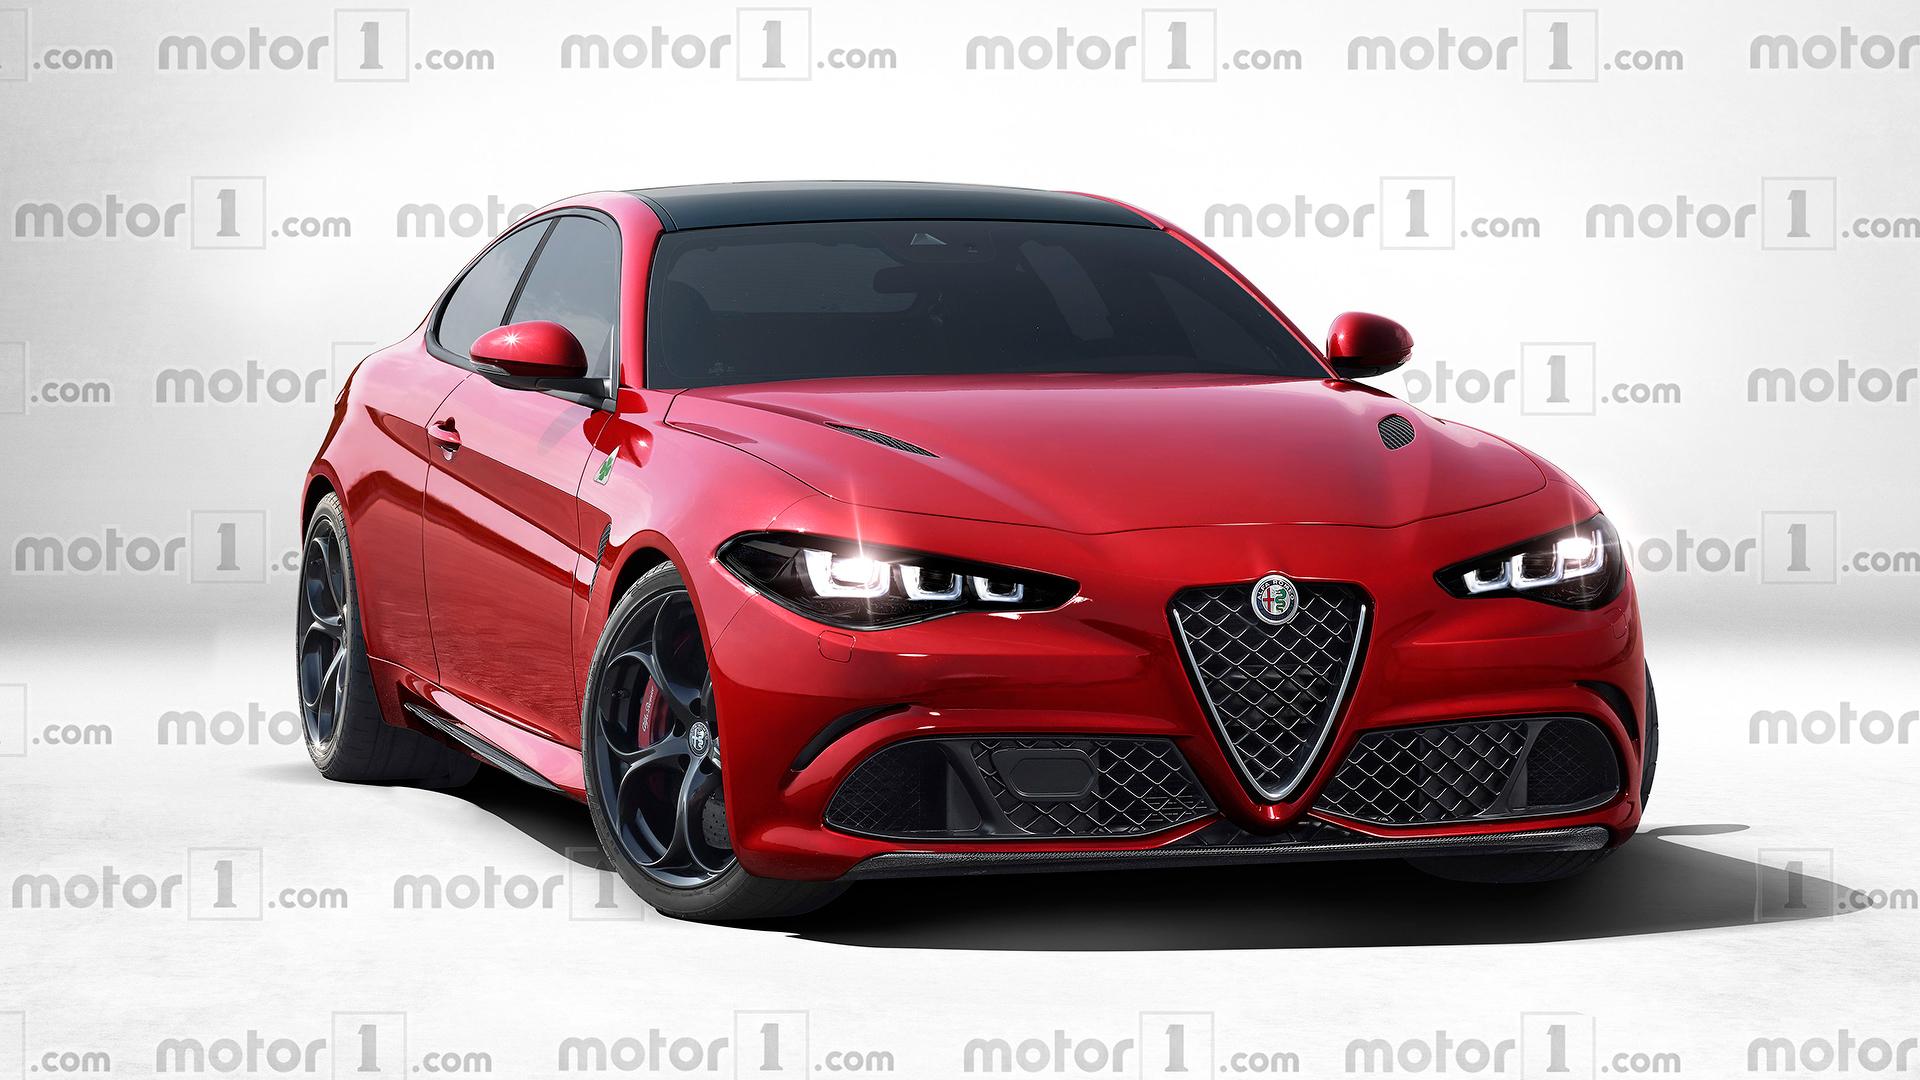 2020 Alfa Romeo GTV 12